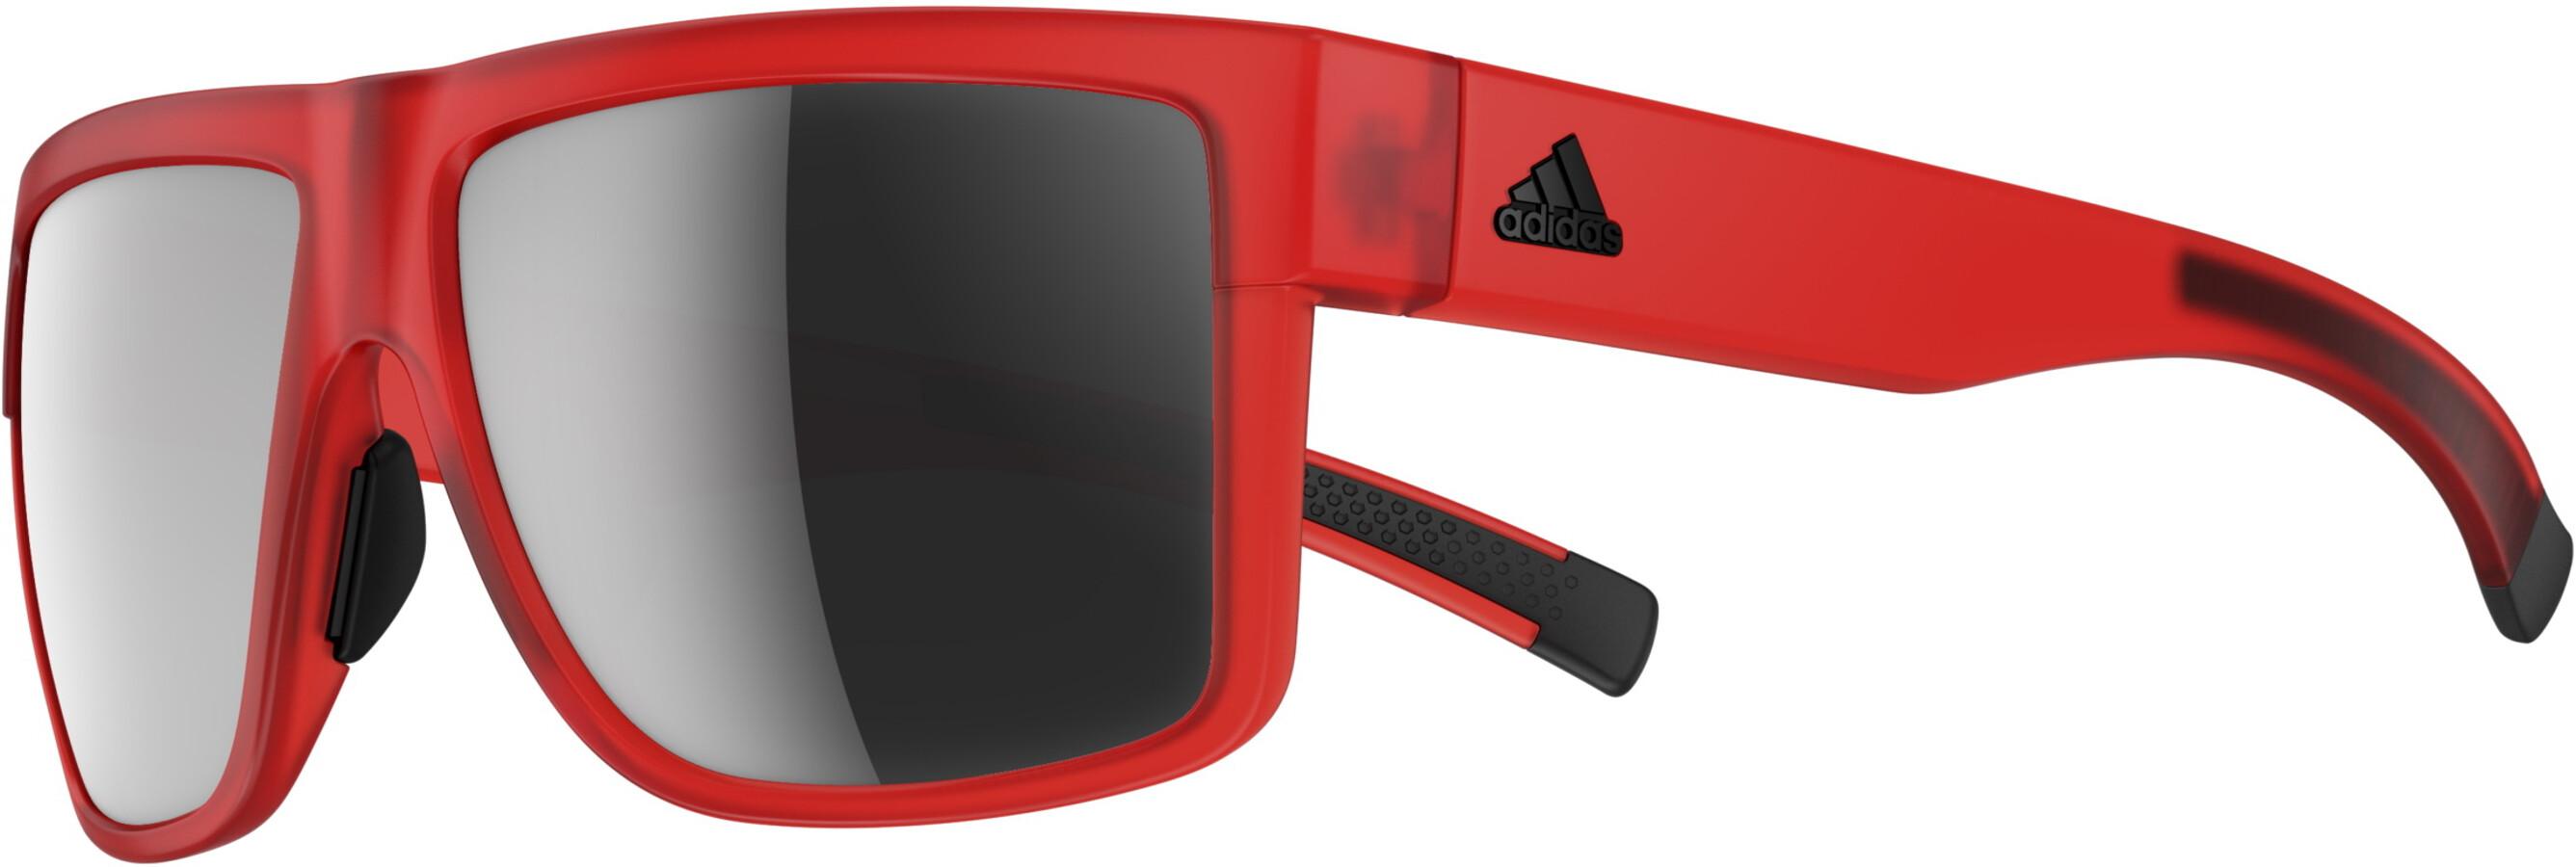 f995dec808f3 adidas 3 Matic Sykkelbriller rød